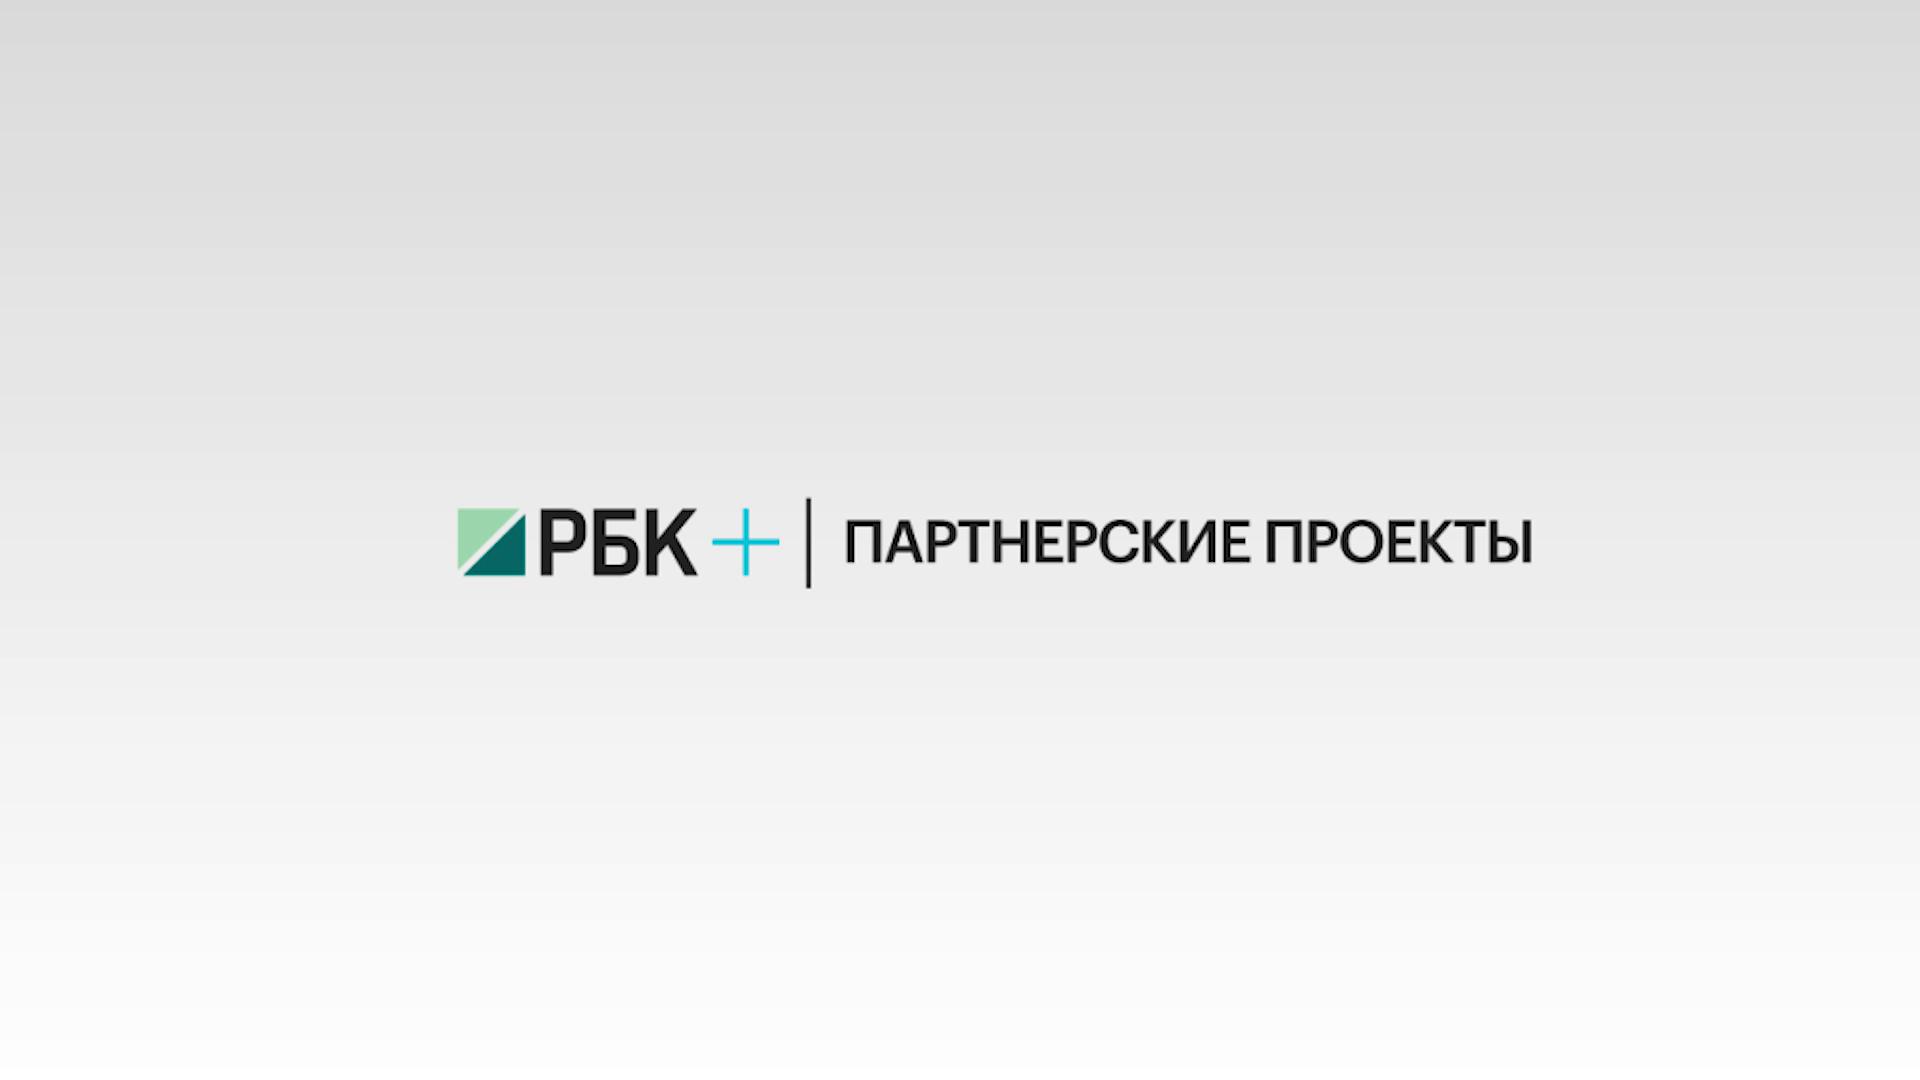 Programme: РБК+ / Событие